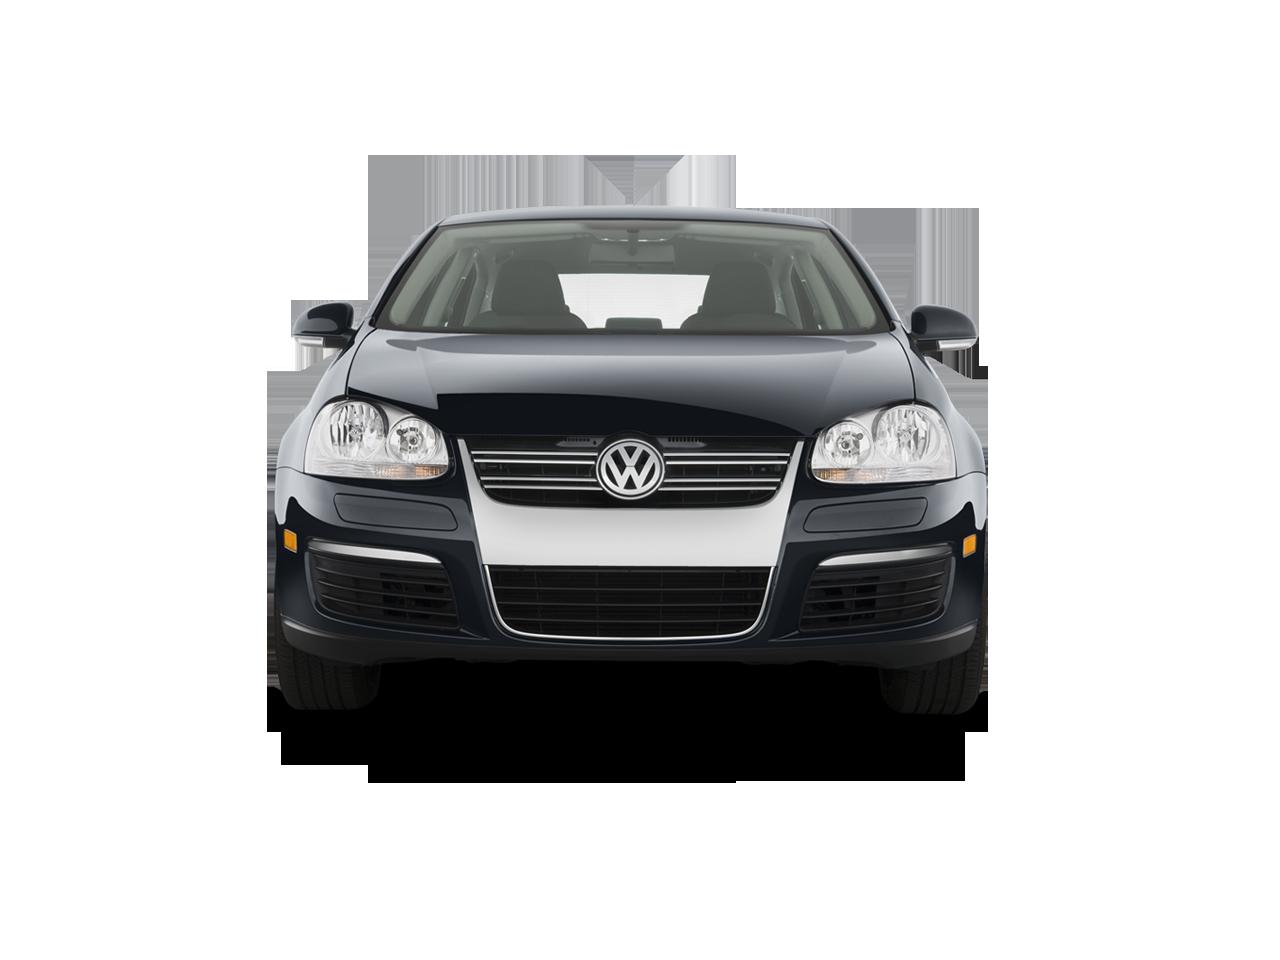 2009 volkswagen jetta tdi volkswagen fuel efficient sedan review automobile magazine. Black Bedroom Furniture Sets. Home Design Ideas